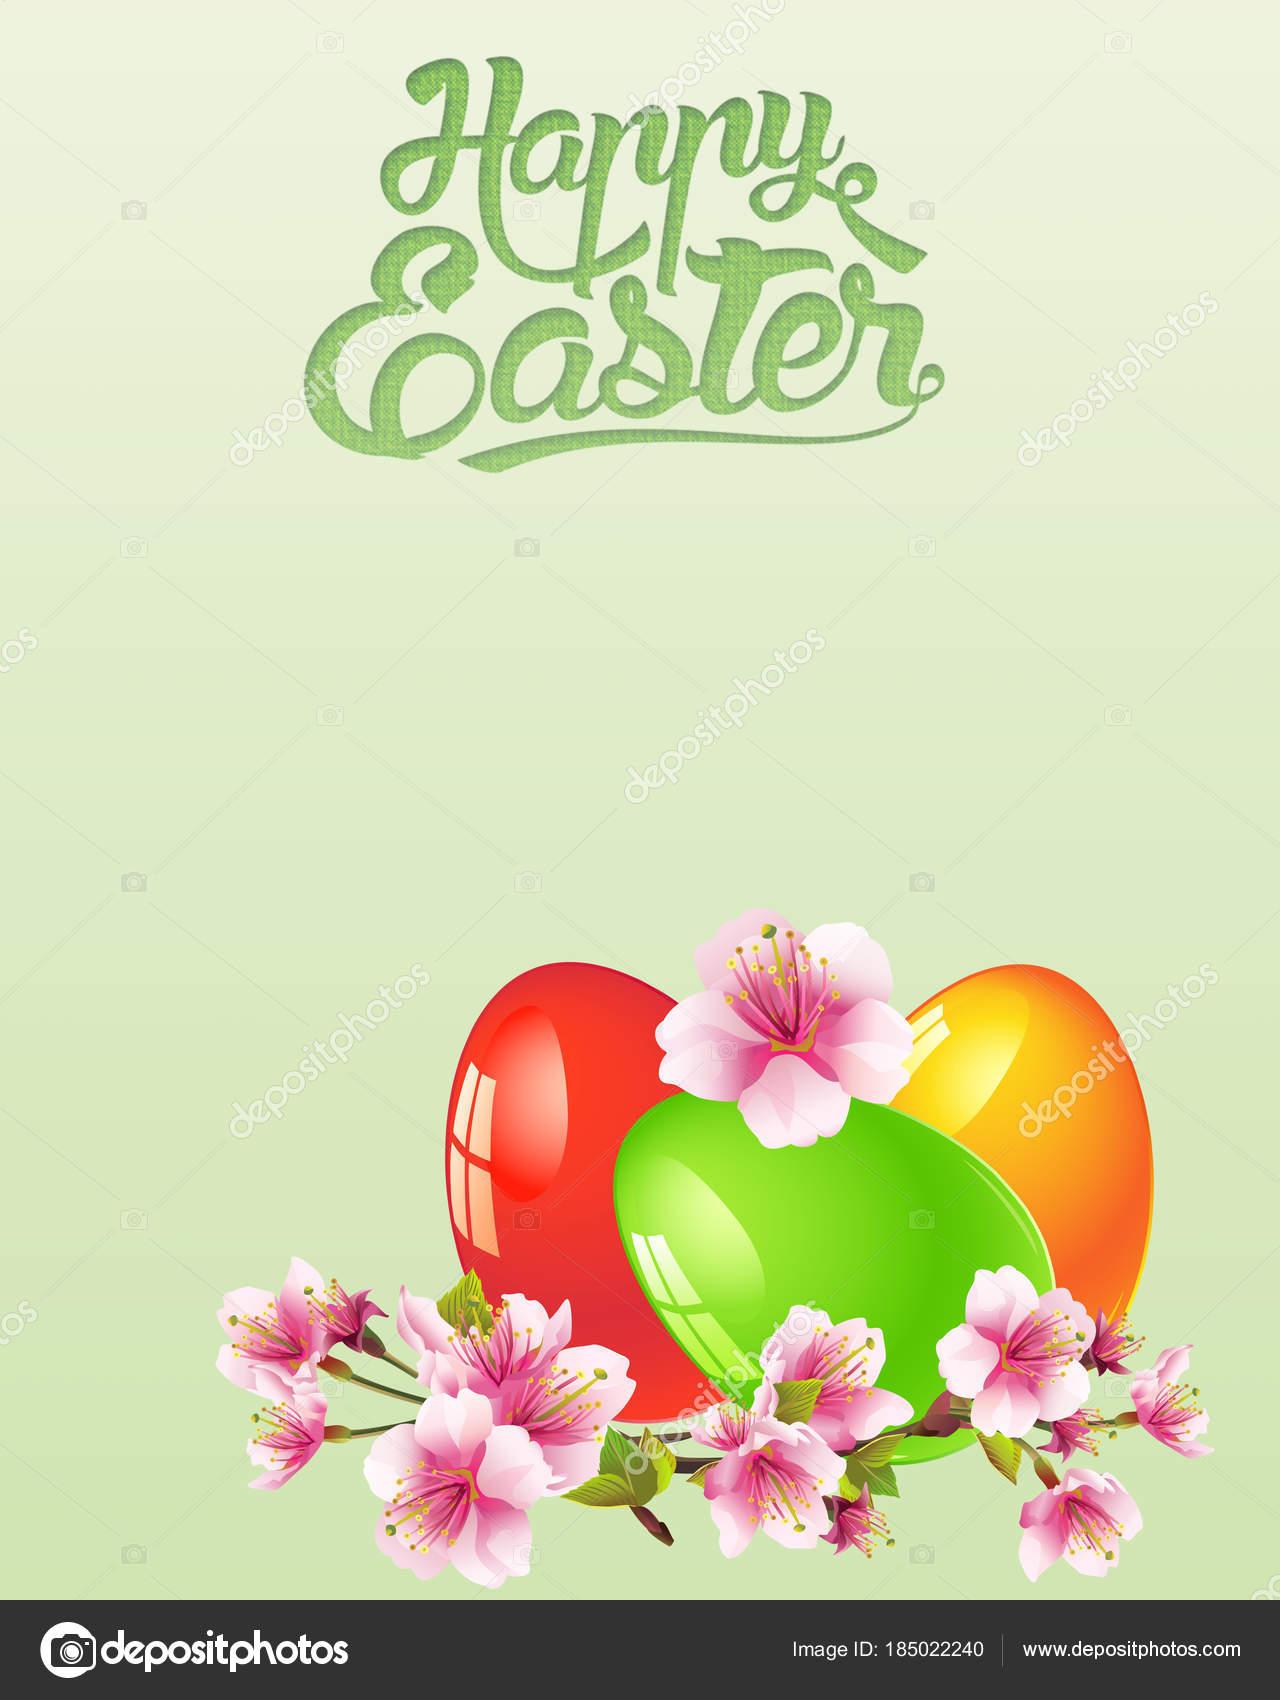 Feliz Pascua Resurrección Primavera Ramas Manzanas Huevos Pascua